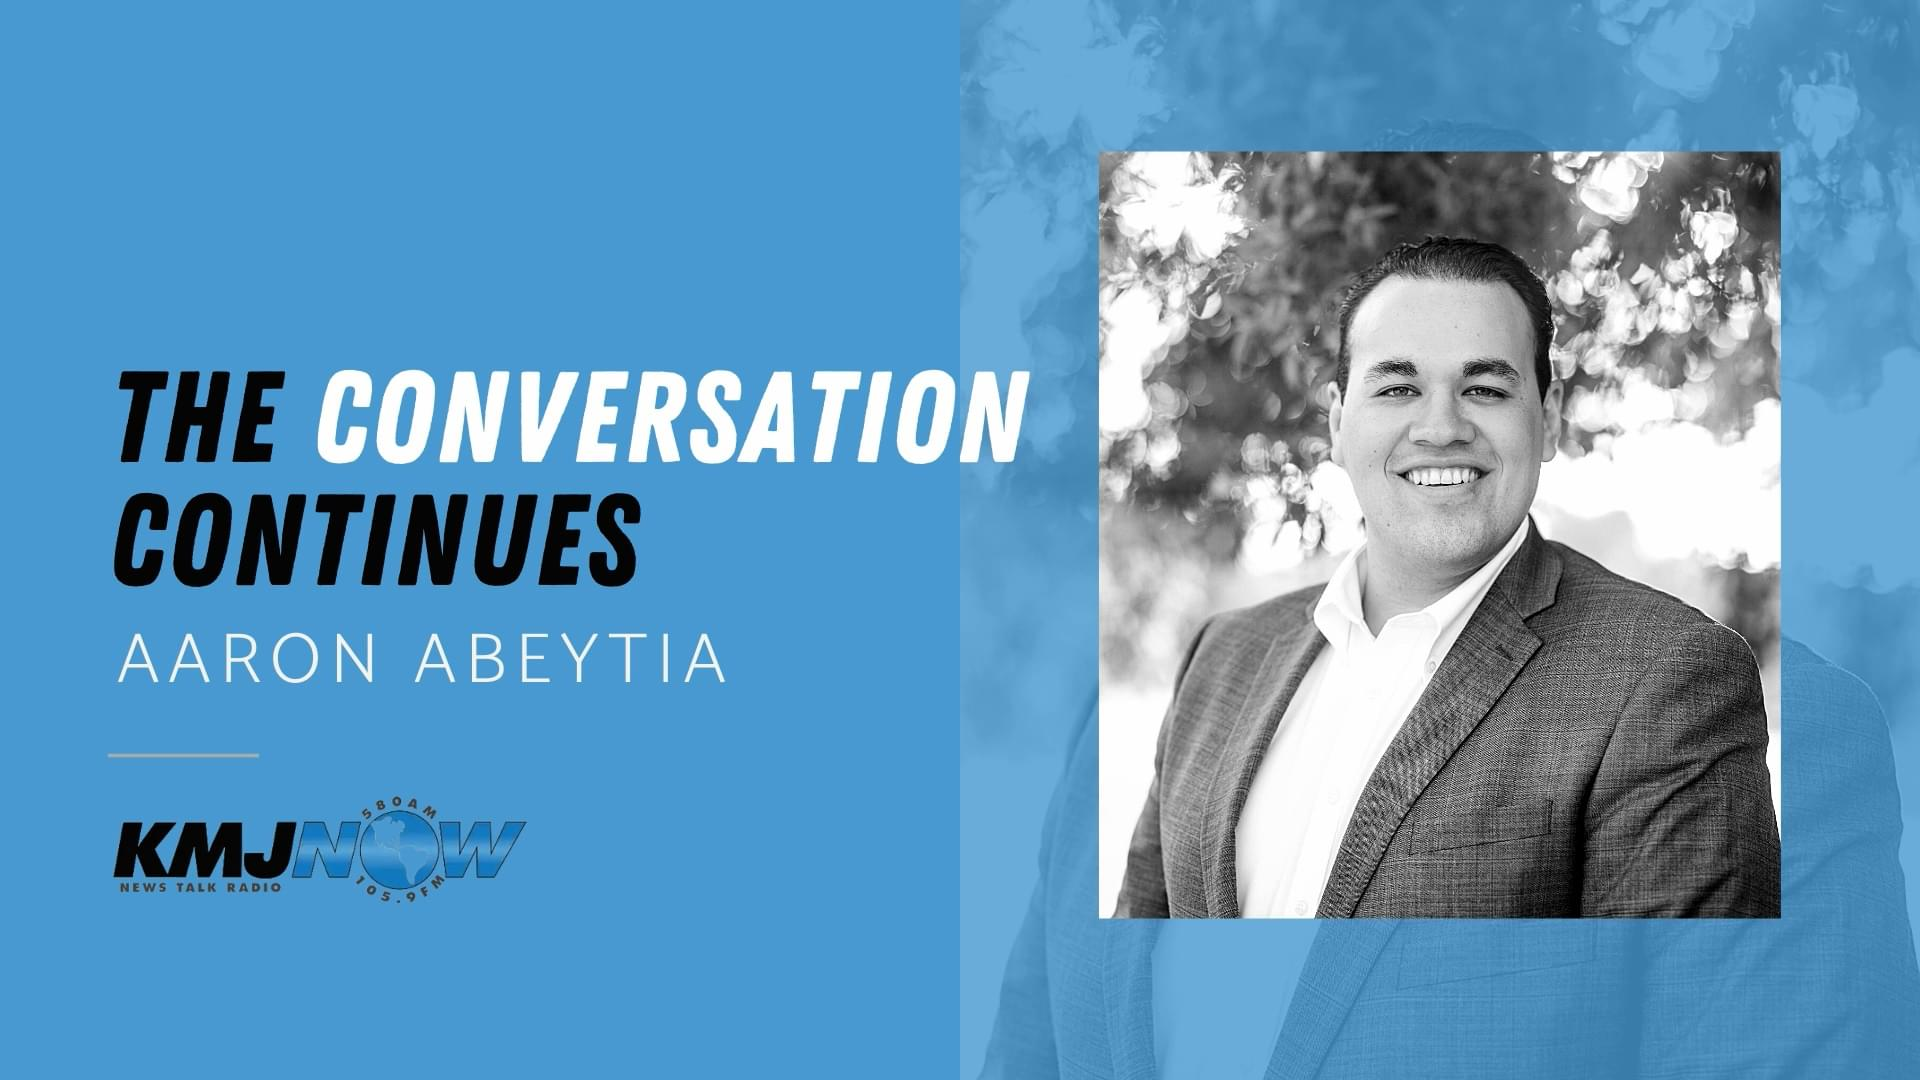 KMJ's Conversation Continues with Aaron Abeytia | Saturday 3.27.21